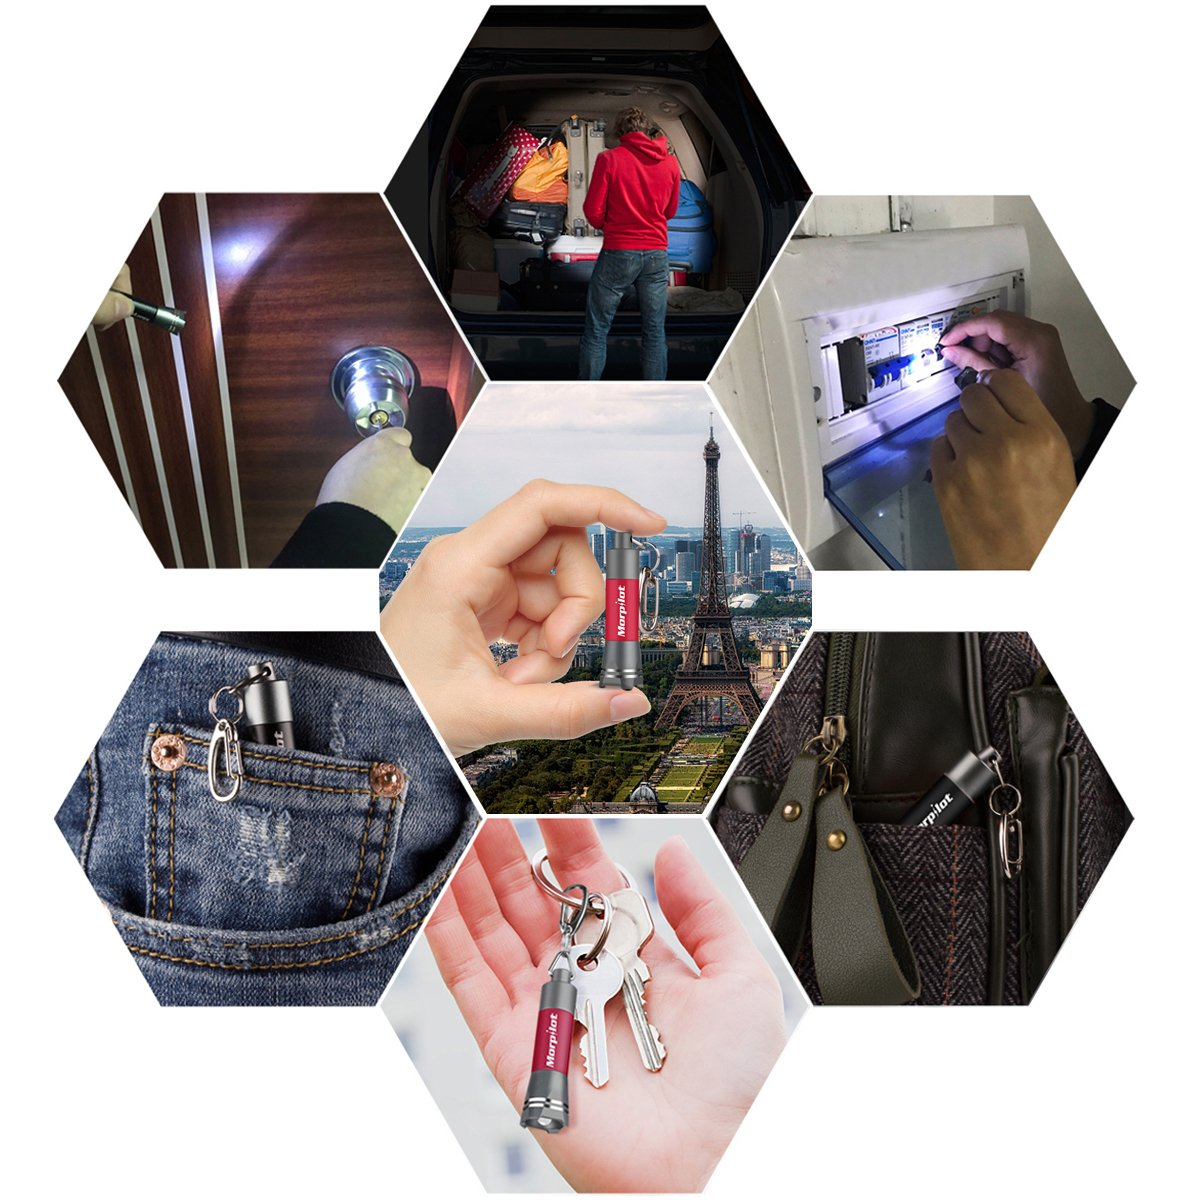 2 Pack 12 LED UV Flashlight Urine Detector - Morpilot Upgrade Ultraviolet Light Blacklight with 2 Pack Mini Keychain Flashlight for Detect Bed Carpet Bug Dog Urine Stain Scorpion